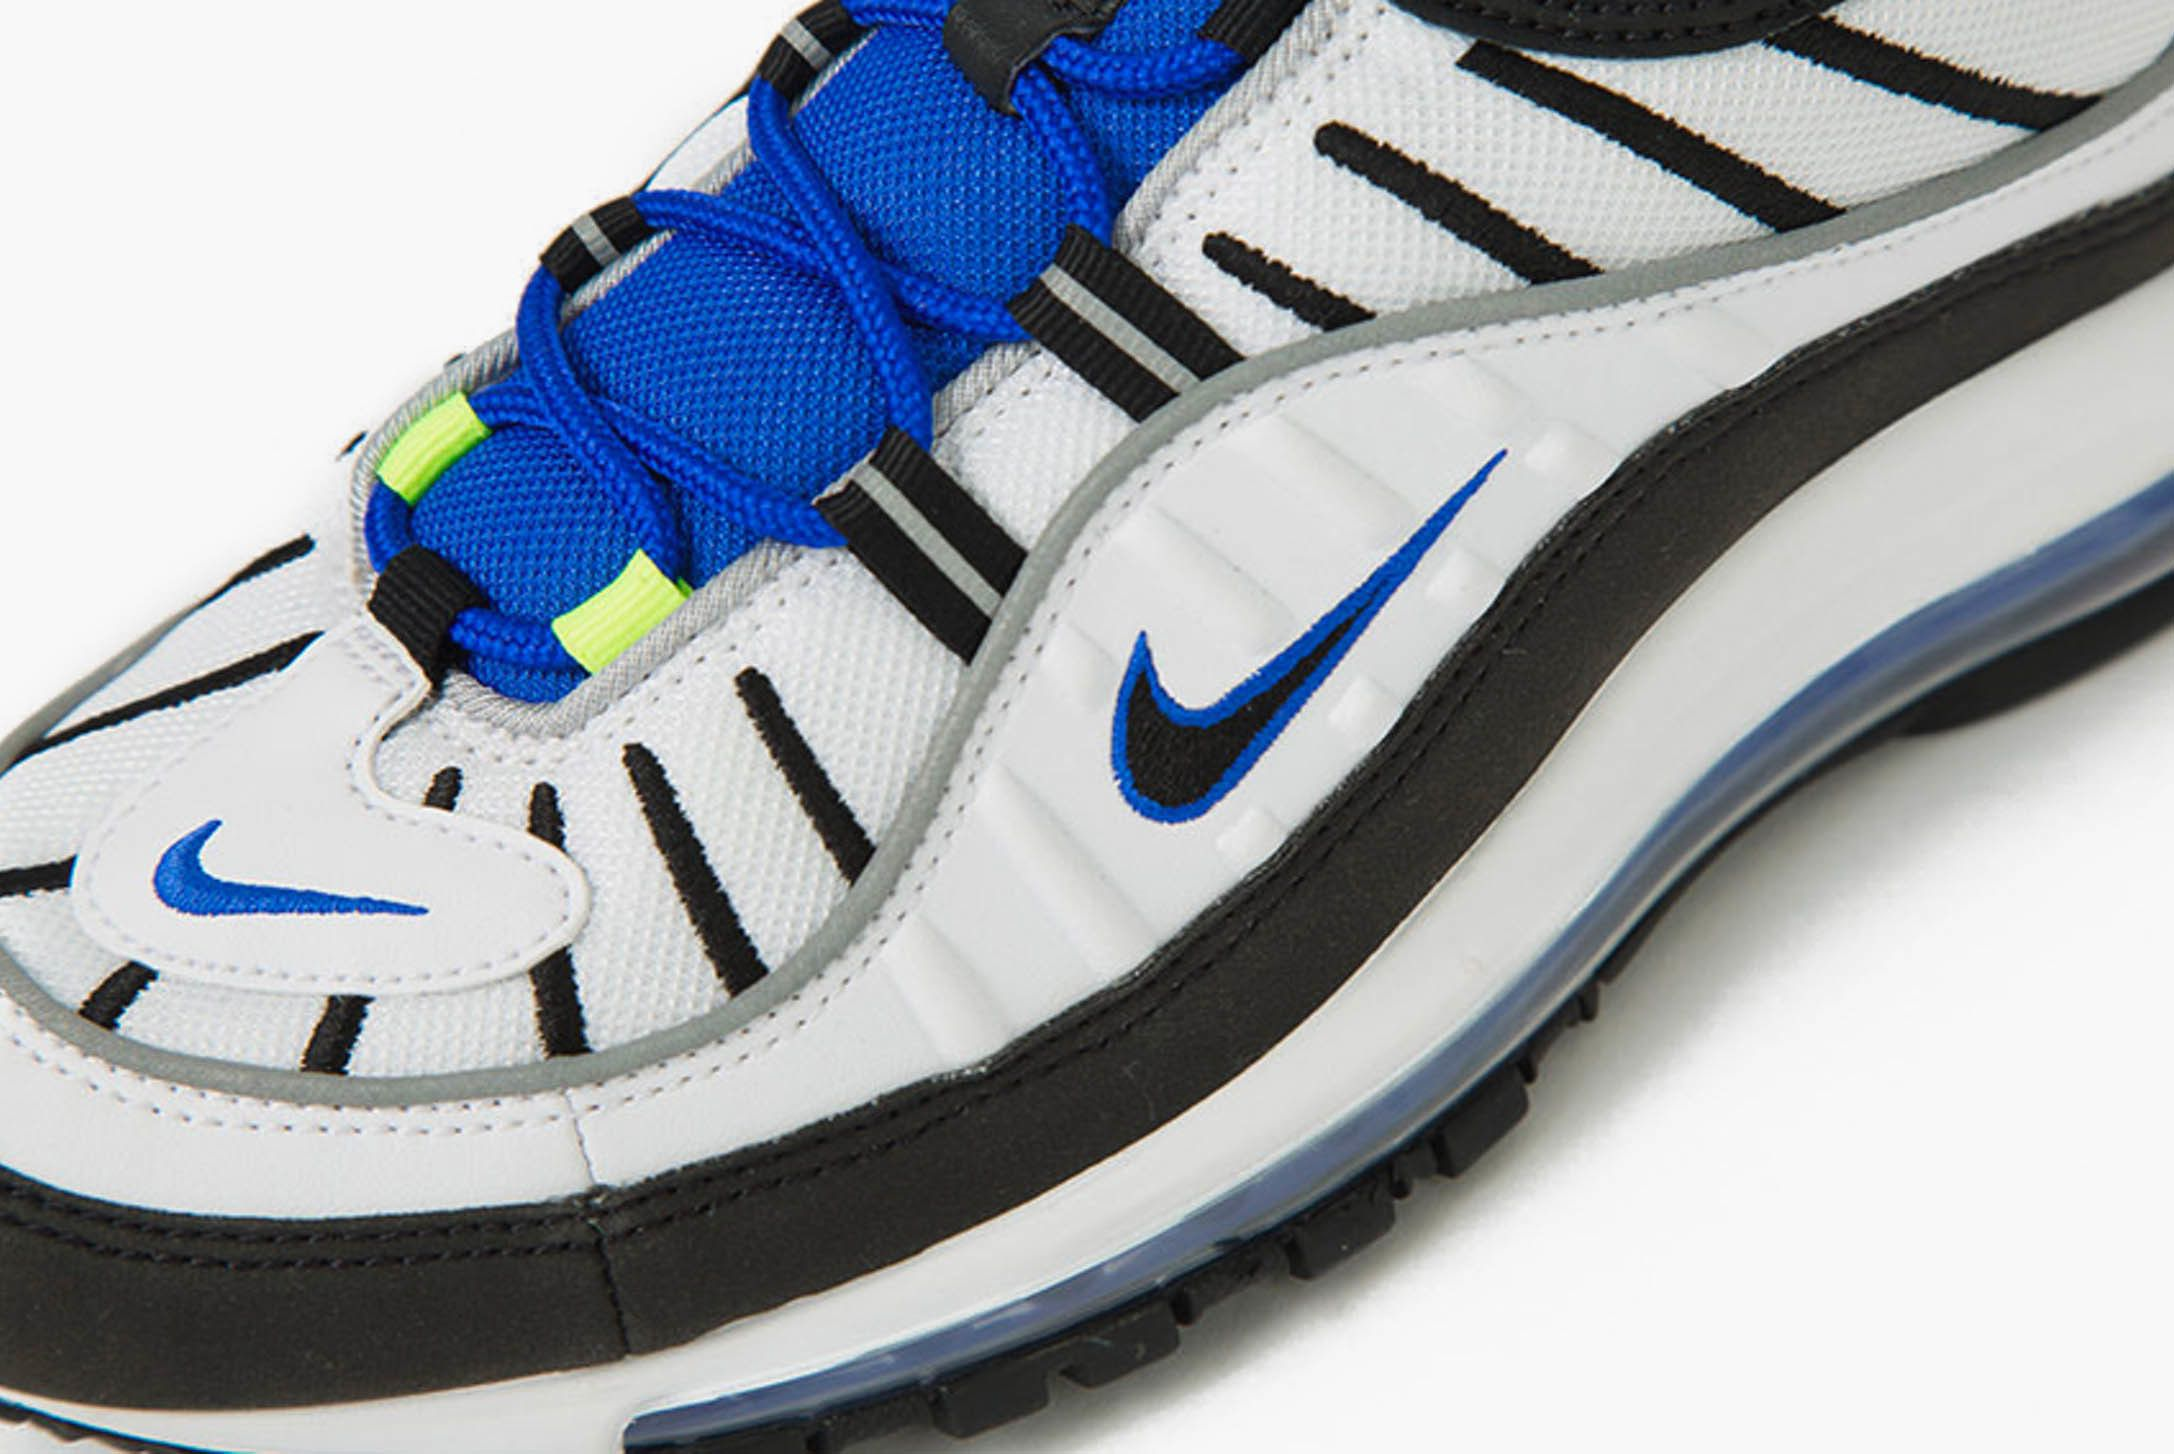 Nike Air Max 98 Racer Blue Release Info 003 Sneaker Freaker